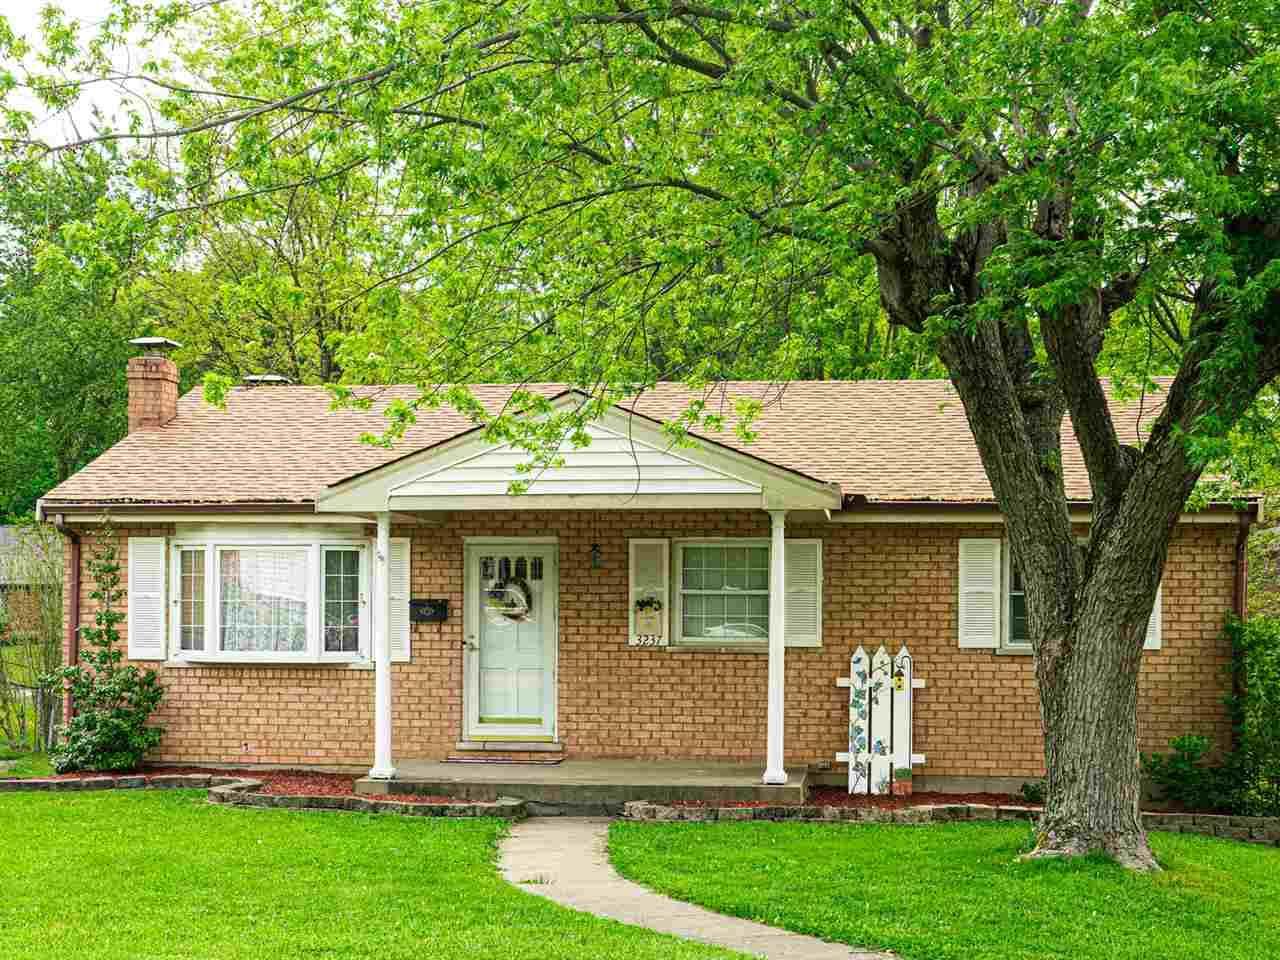 3237 Fairwood Ct - Photo 1